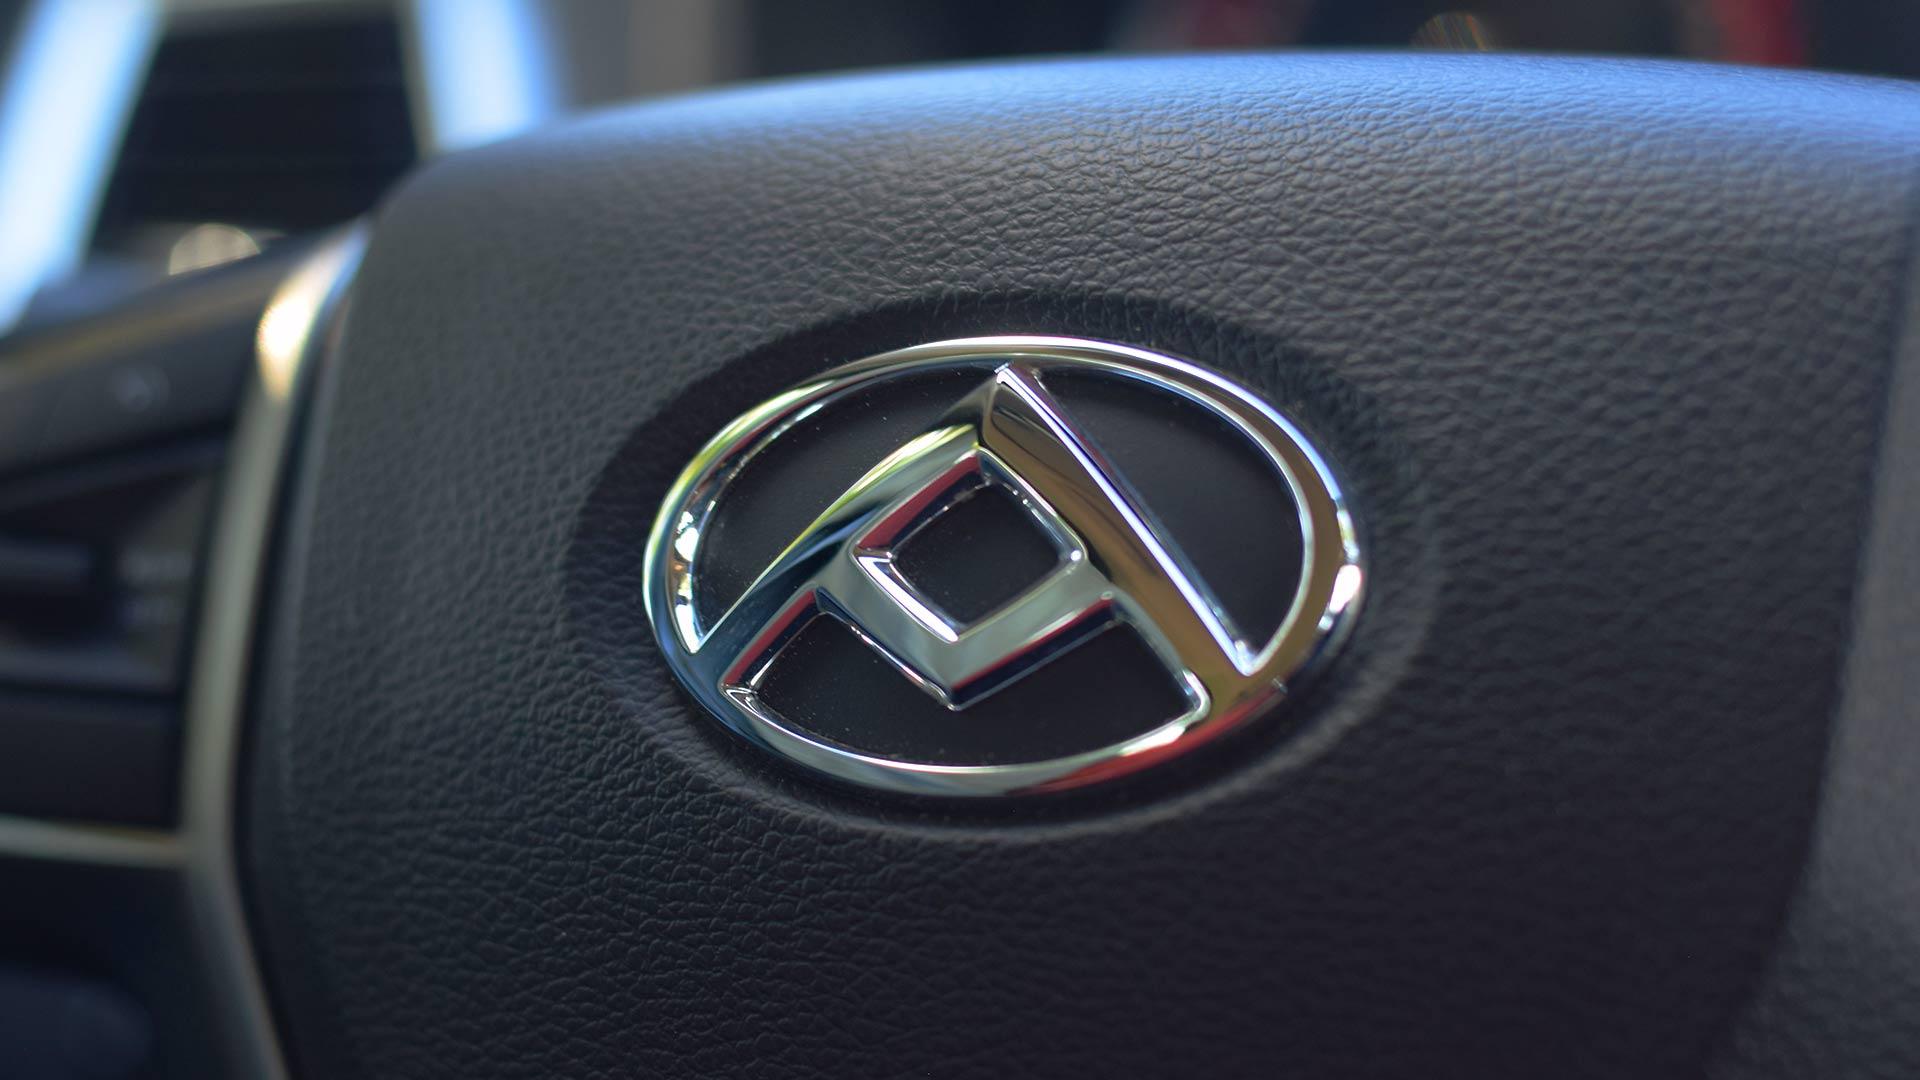 The Maxus T60 steering wheel emblem